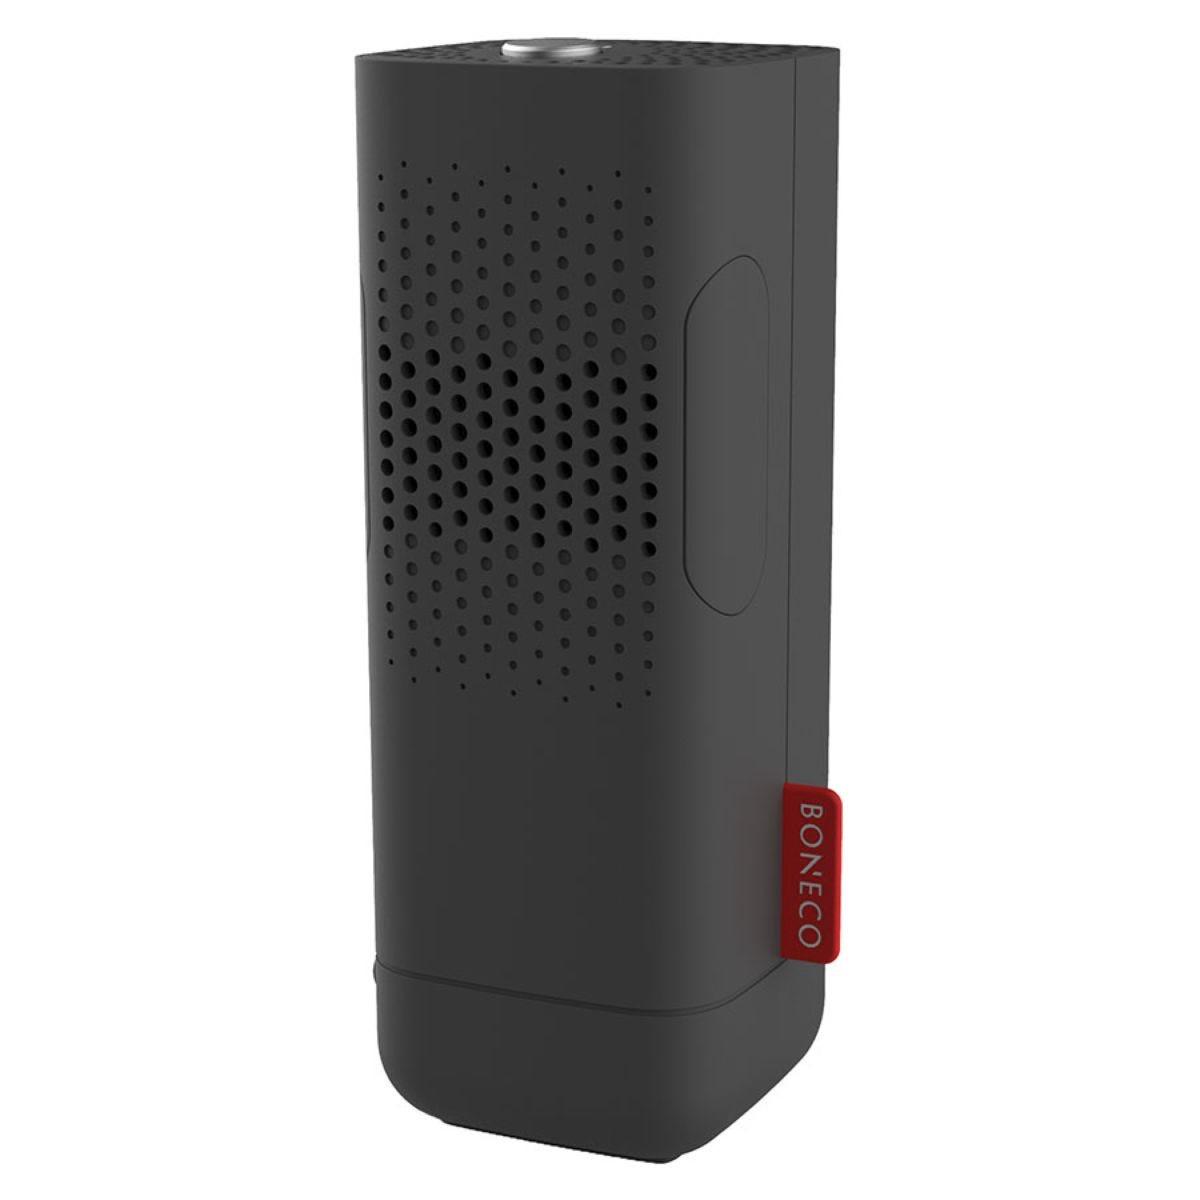 Boneco P50 Portable Air Purifier and Aroma Diffuser – Black